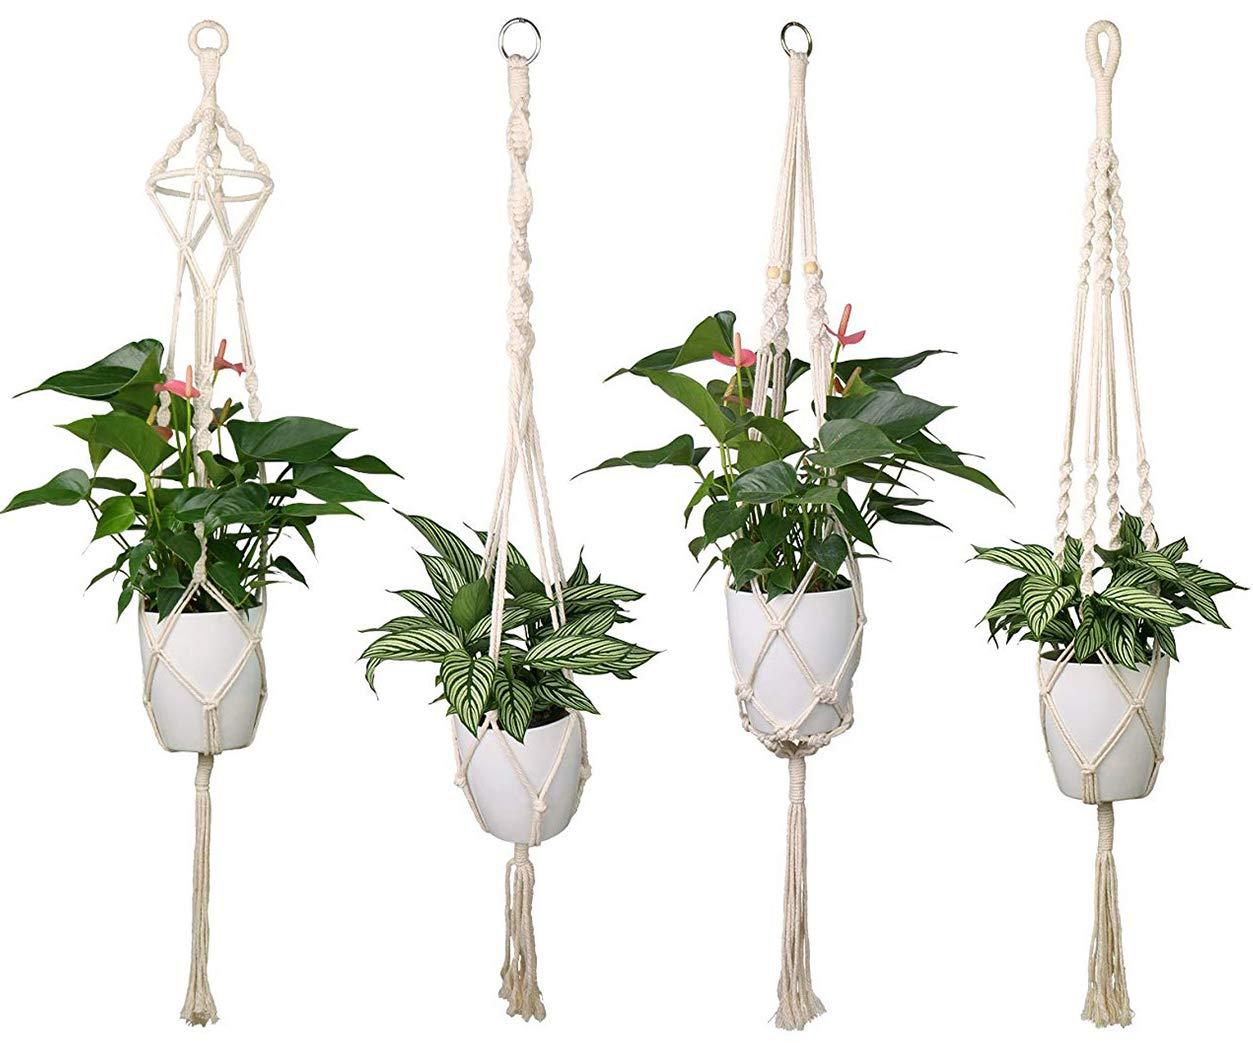 Luxbon 4er Set Makramee Blumenampel Baumwollseil Hängeampel Blumentopf Pflanzen Halter Aufhänger